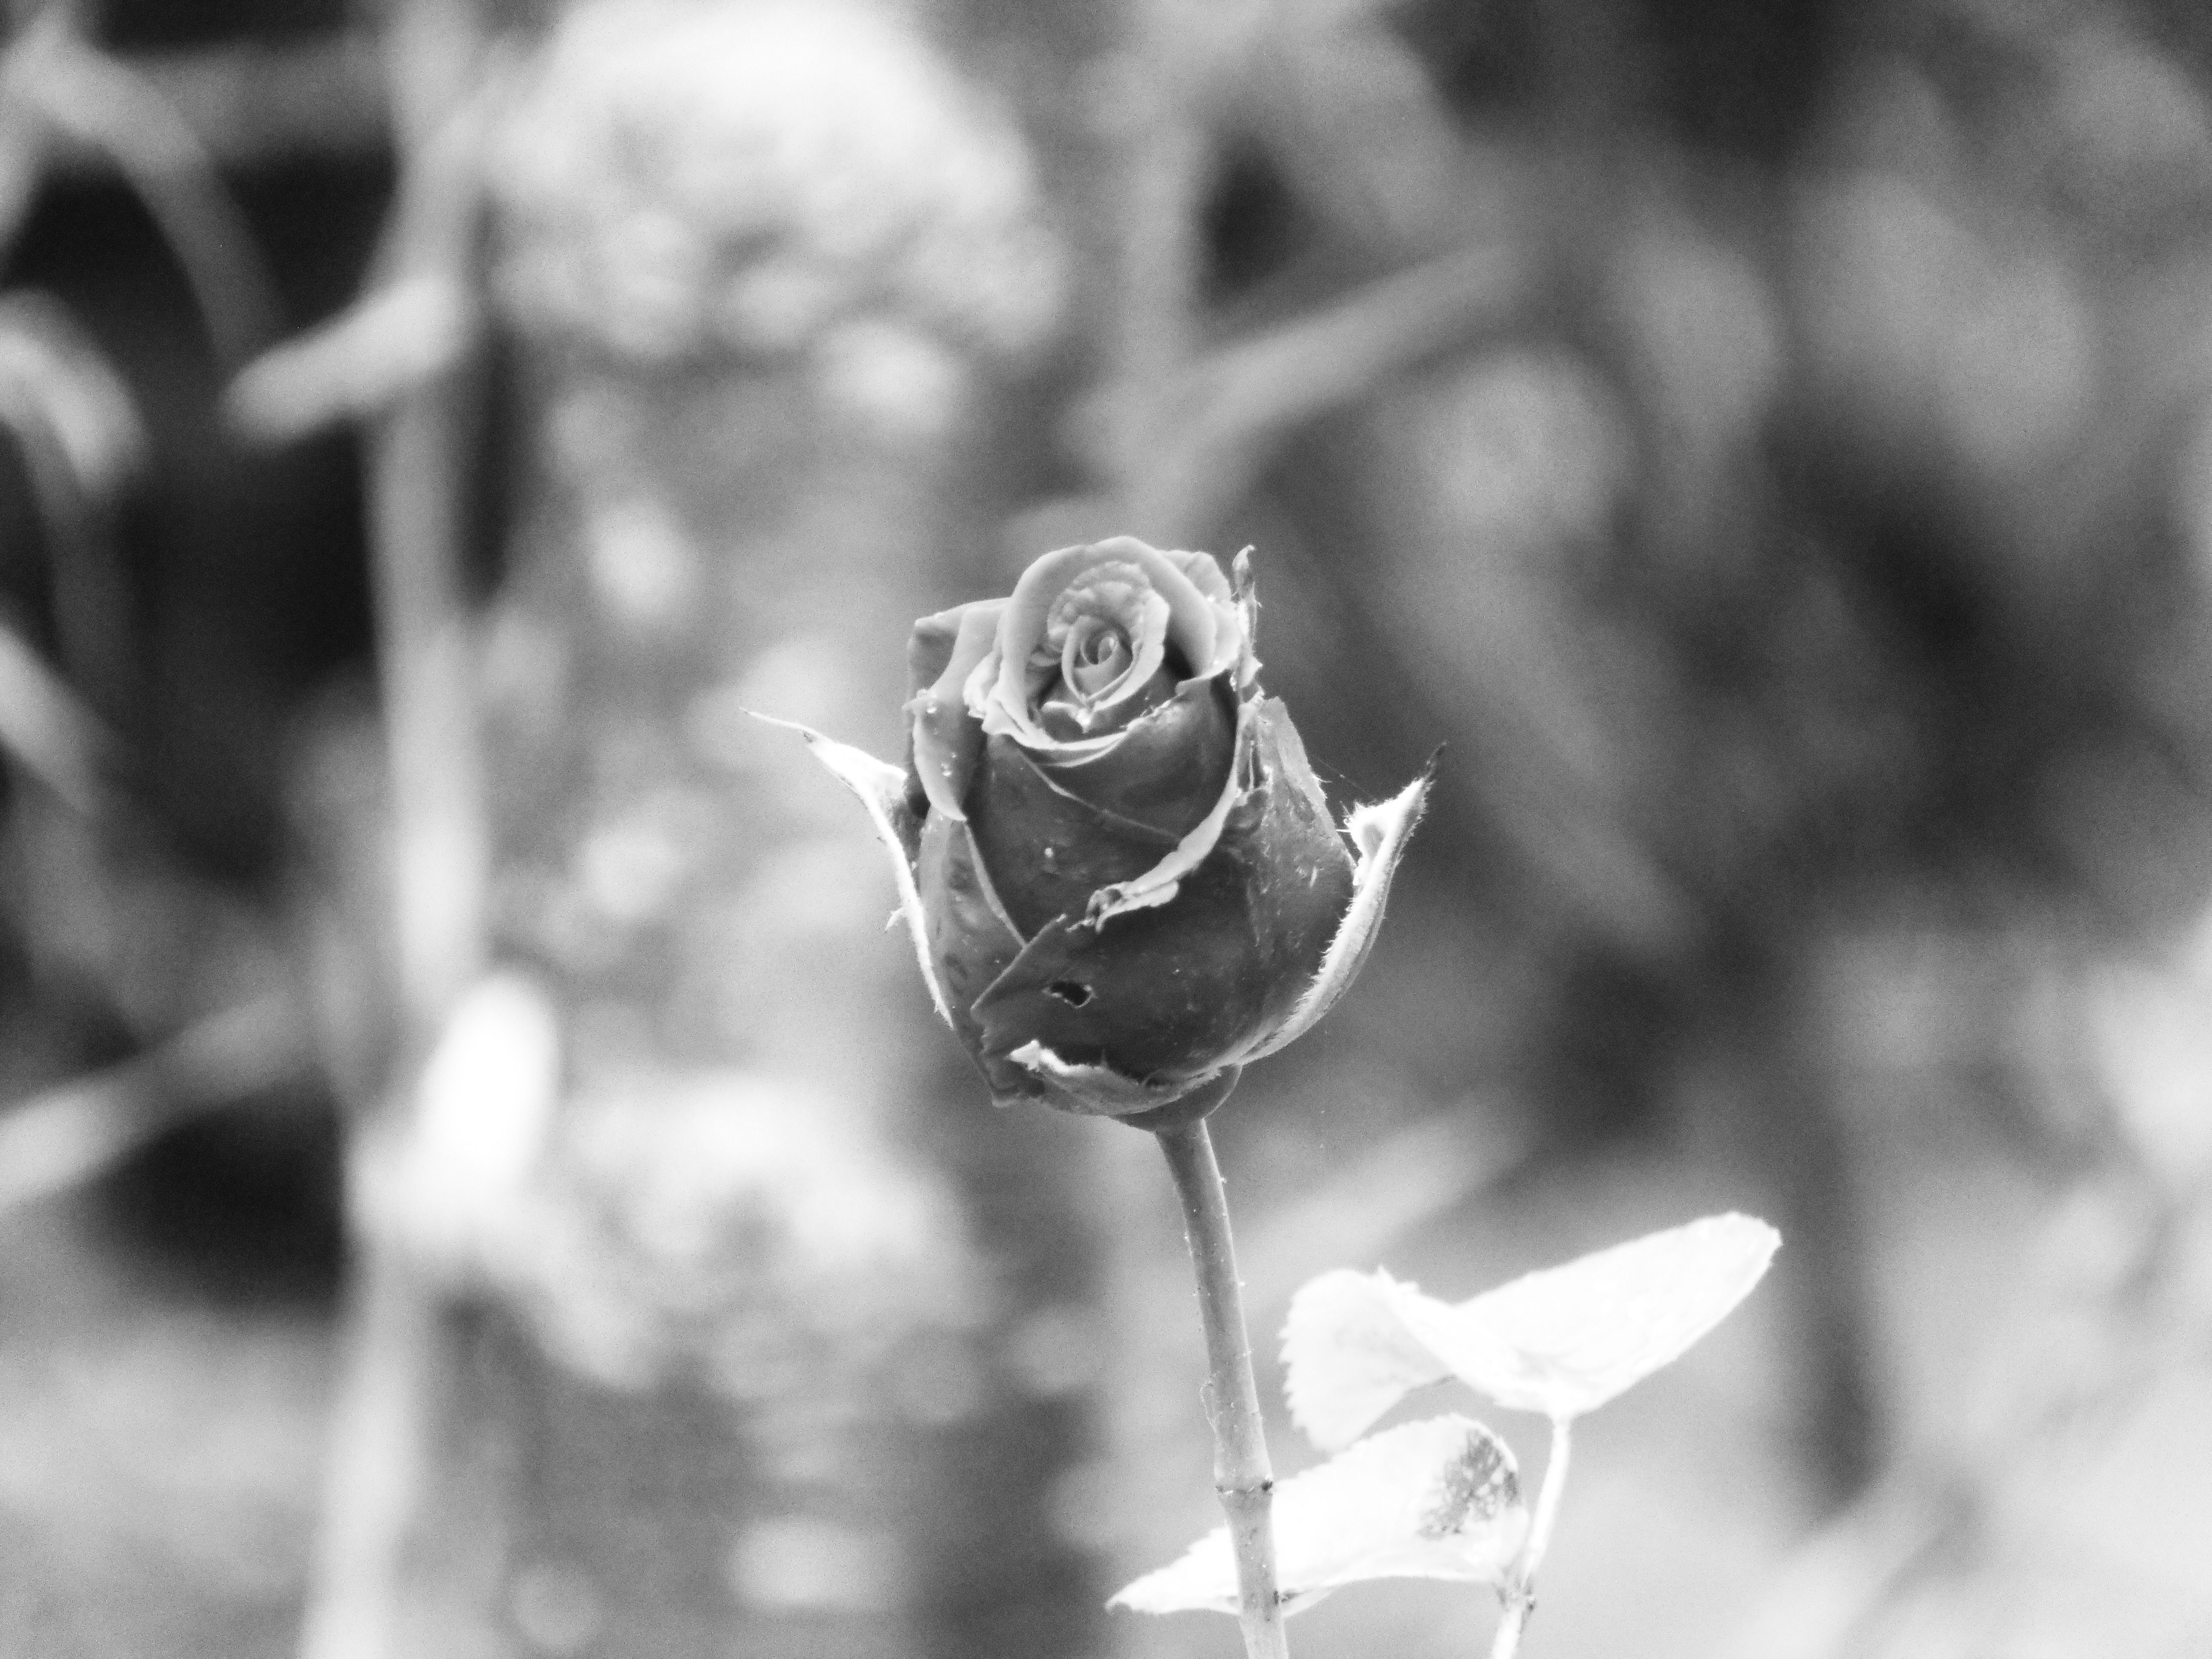 #photography #photographylovers #photographysouls #photographyeveryday #photographylover  #photographylife  #photographyy #photographylove #photographyaddict #photographydaily #photographyisart #photographyaccount  #photographyday #photographynature #photographysoul #photographyblog #photography101 #exmoor